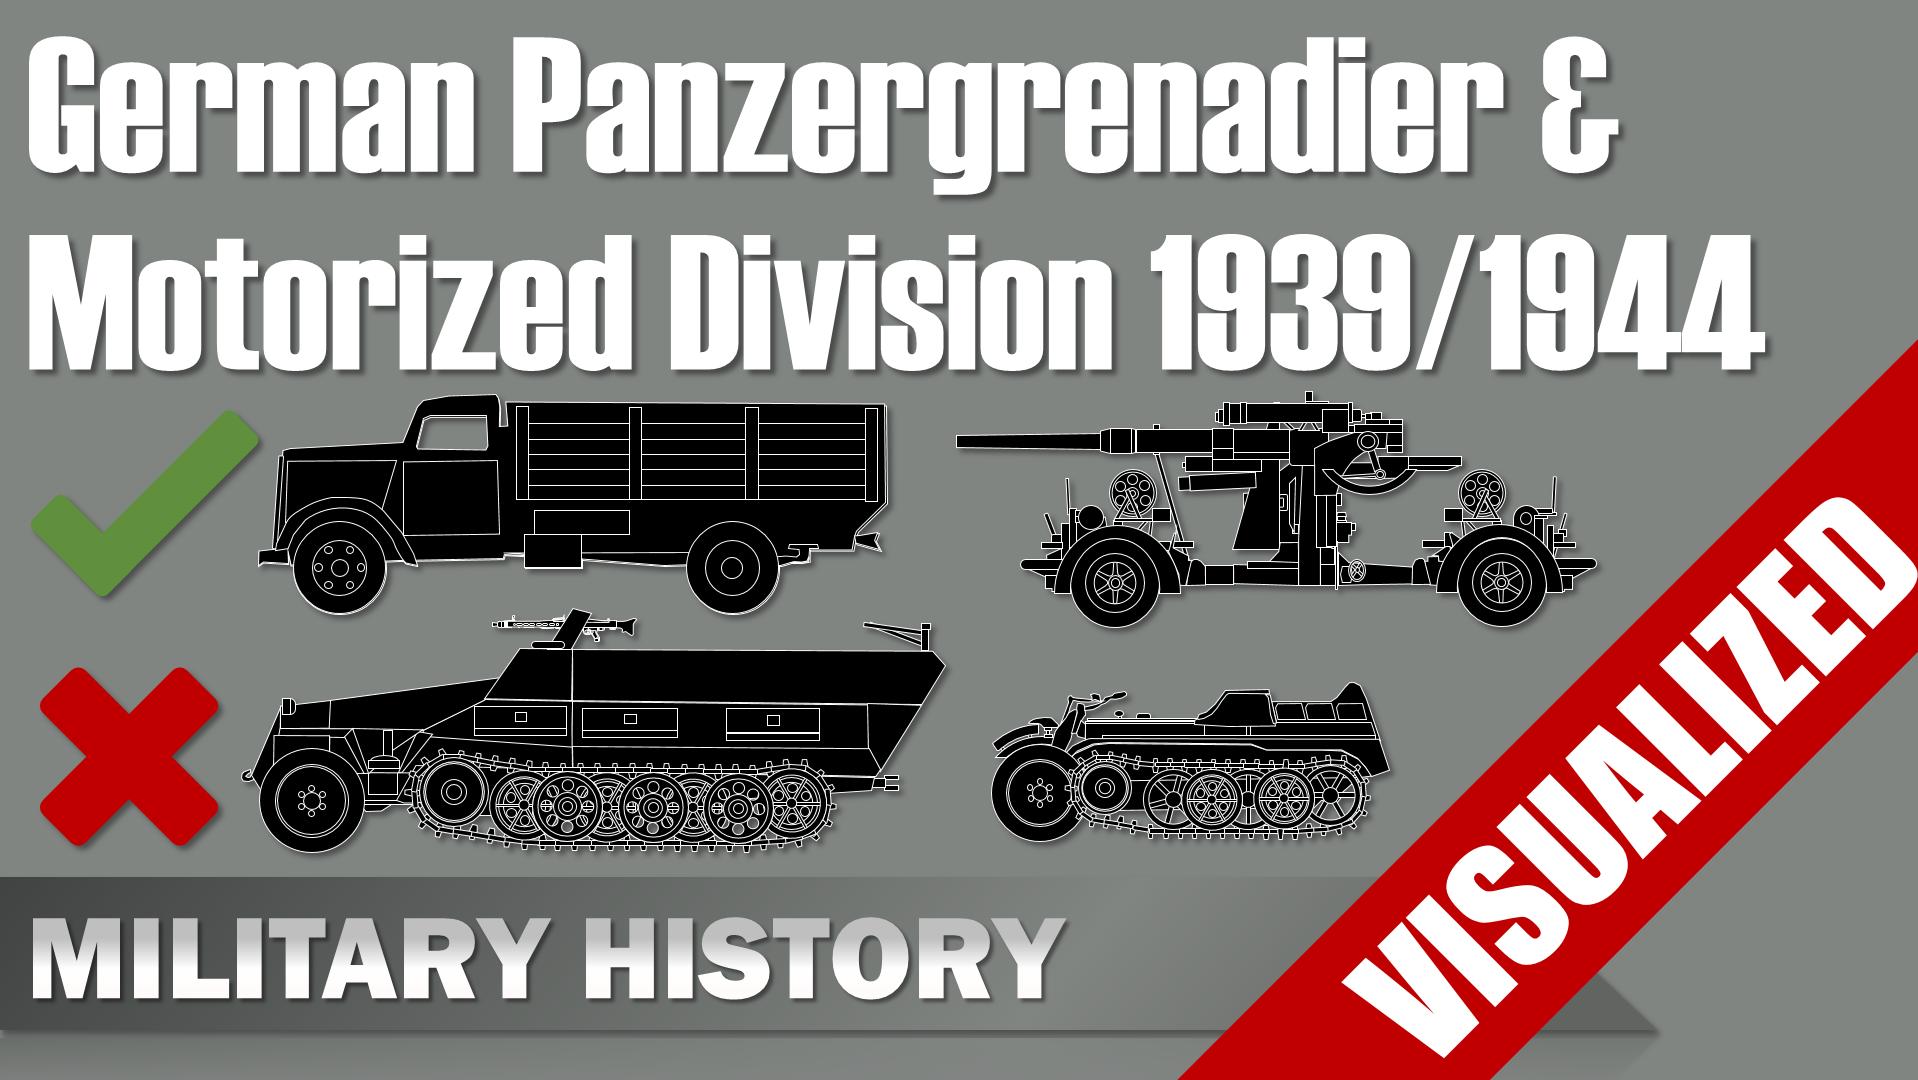 Panzergrenadier Division 1944 Motorized Infantry Divsion 1939